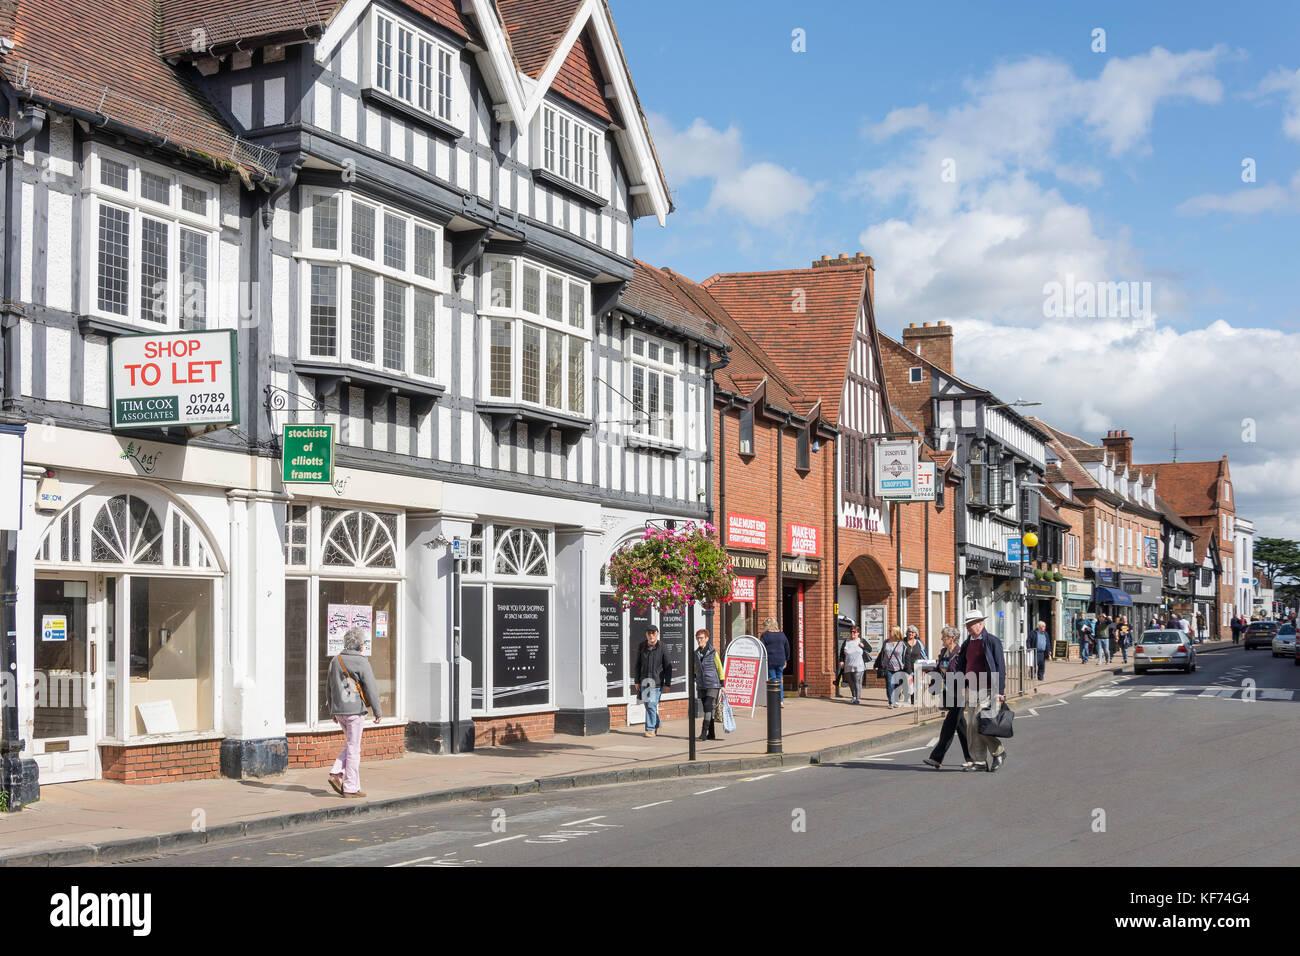 Wood Street, Stratford-upon-Avon, Warwickshire, England, United Kingdom - Stock Image